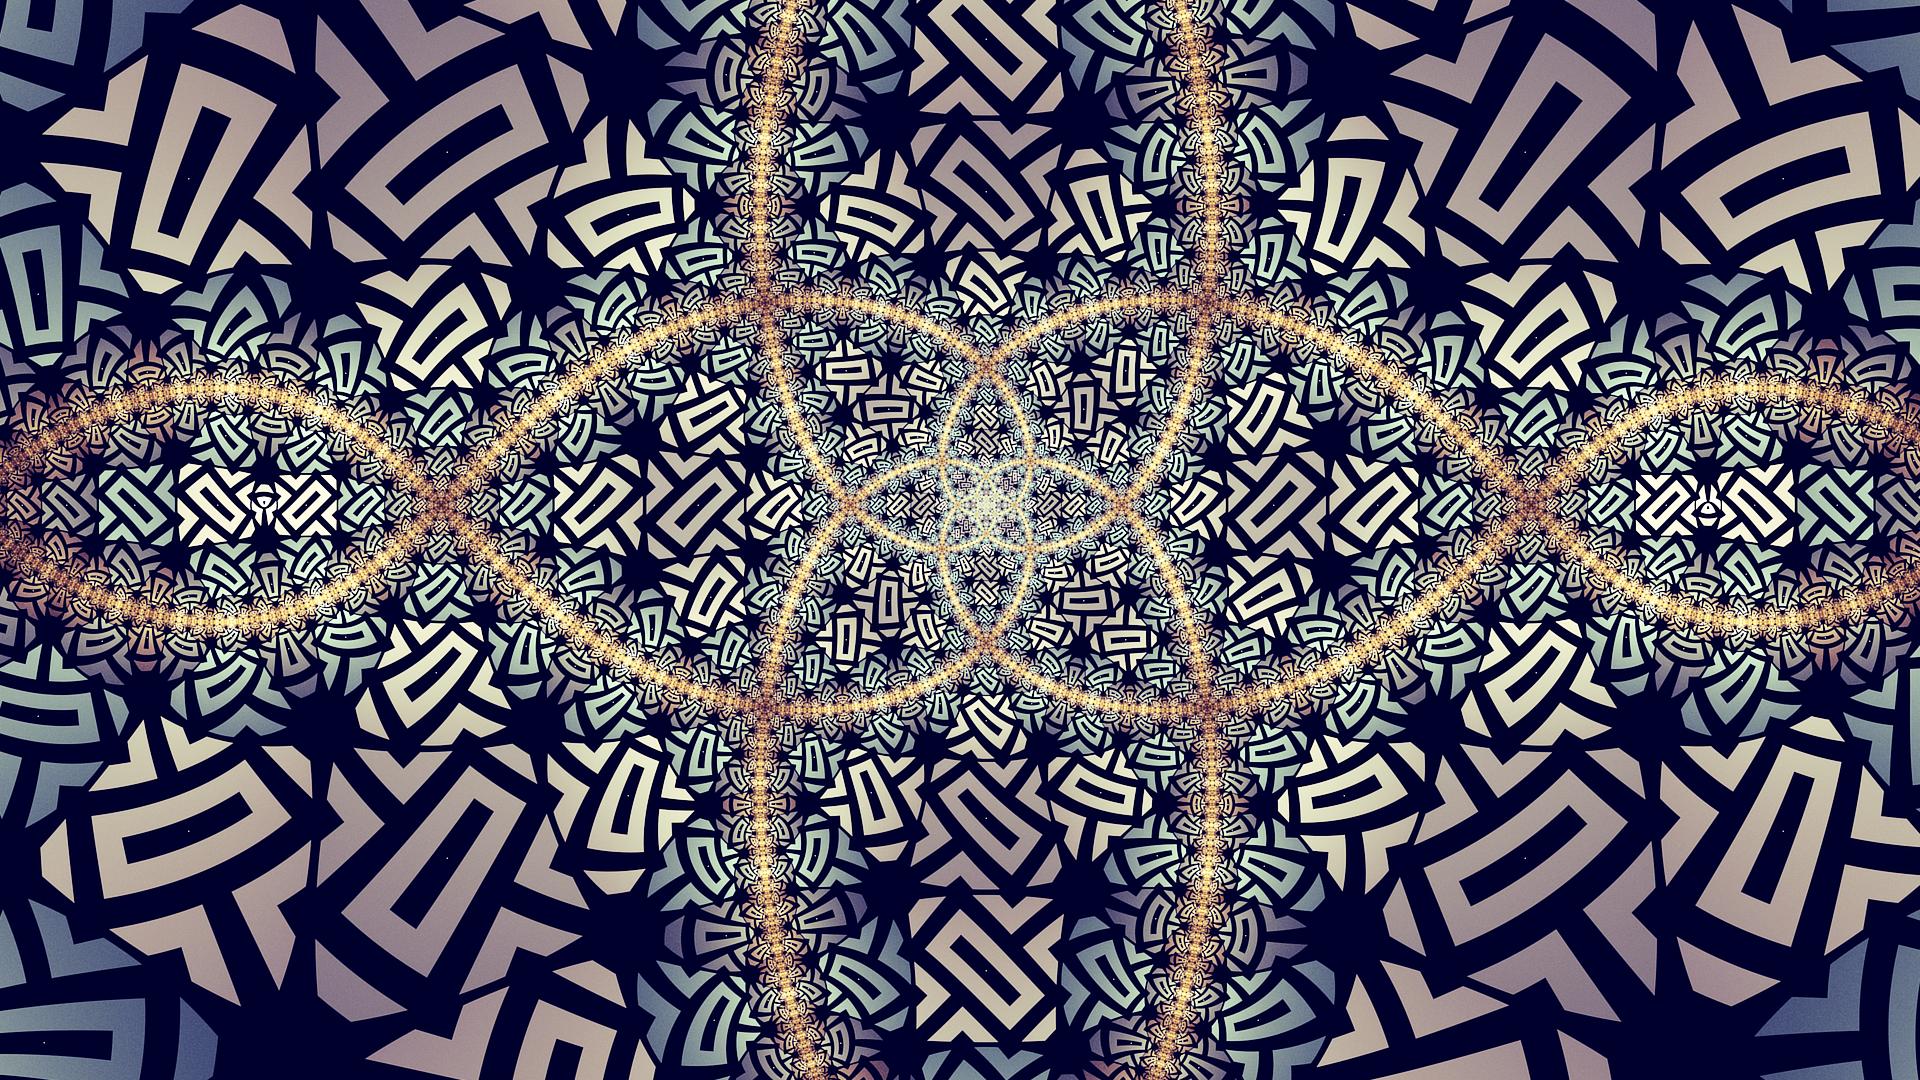 Artistic Symmetry Digital Art 1920x1080